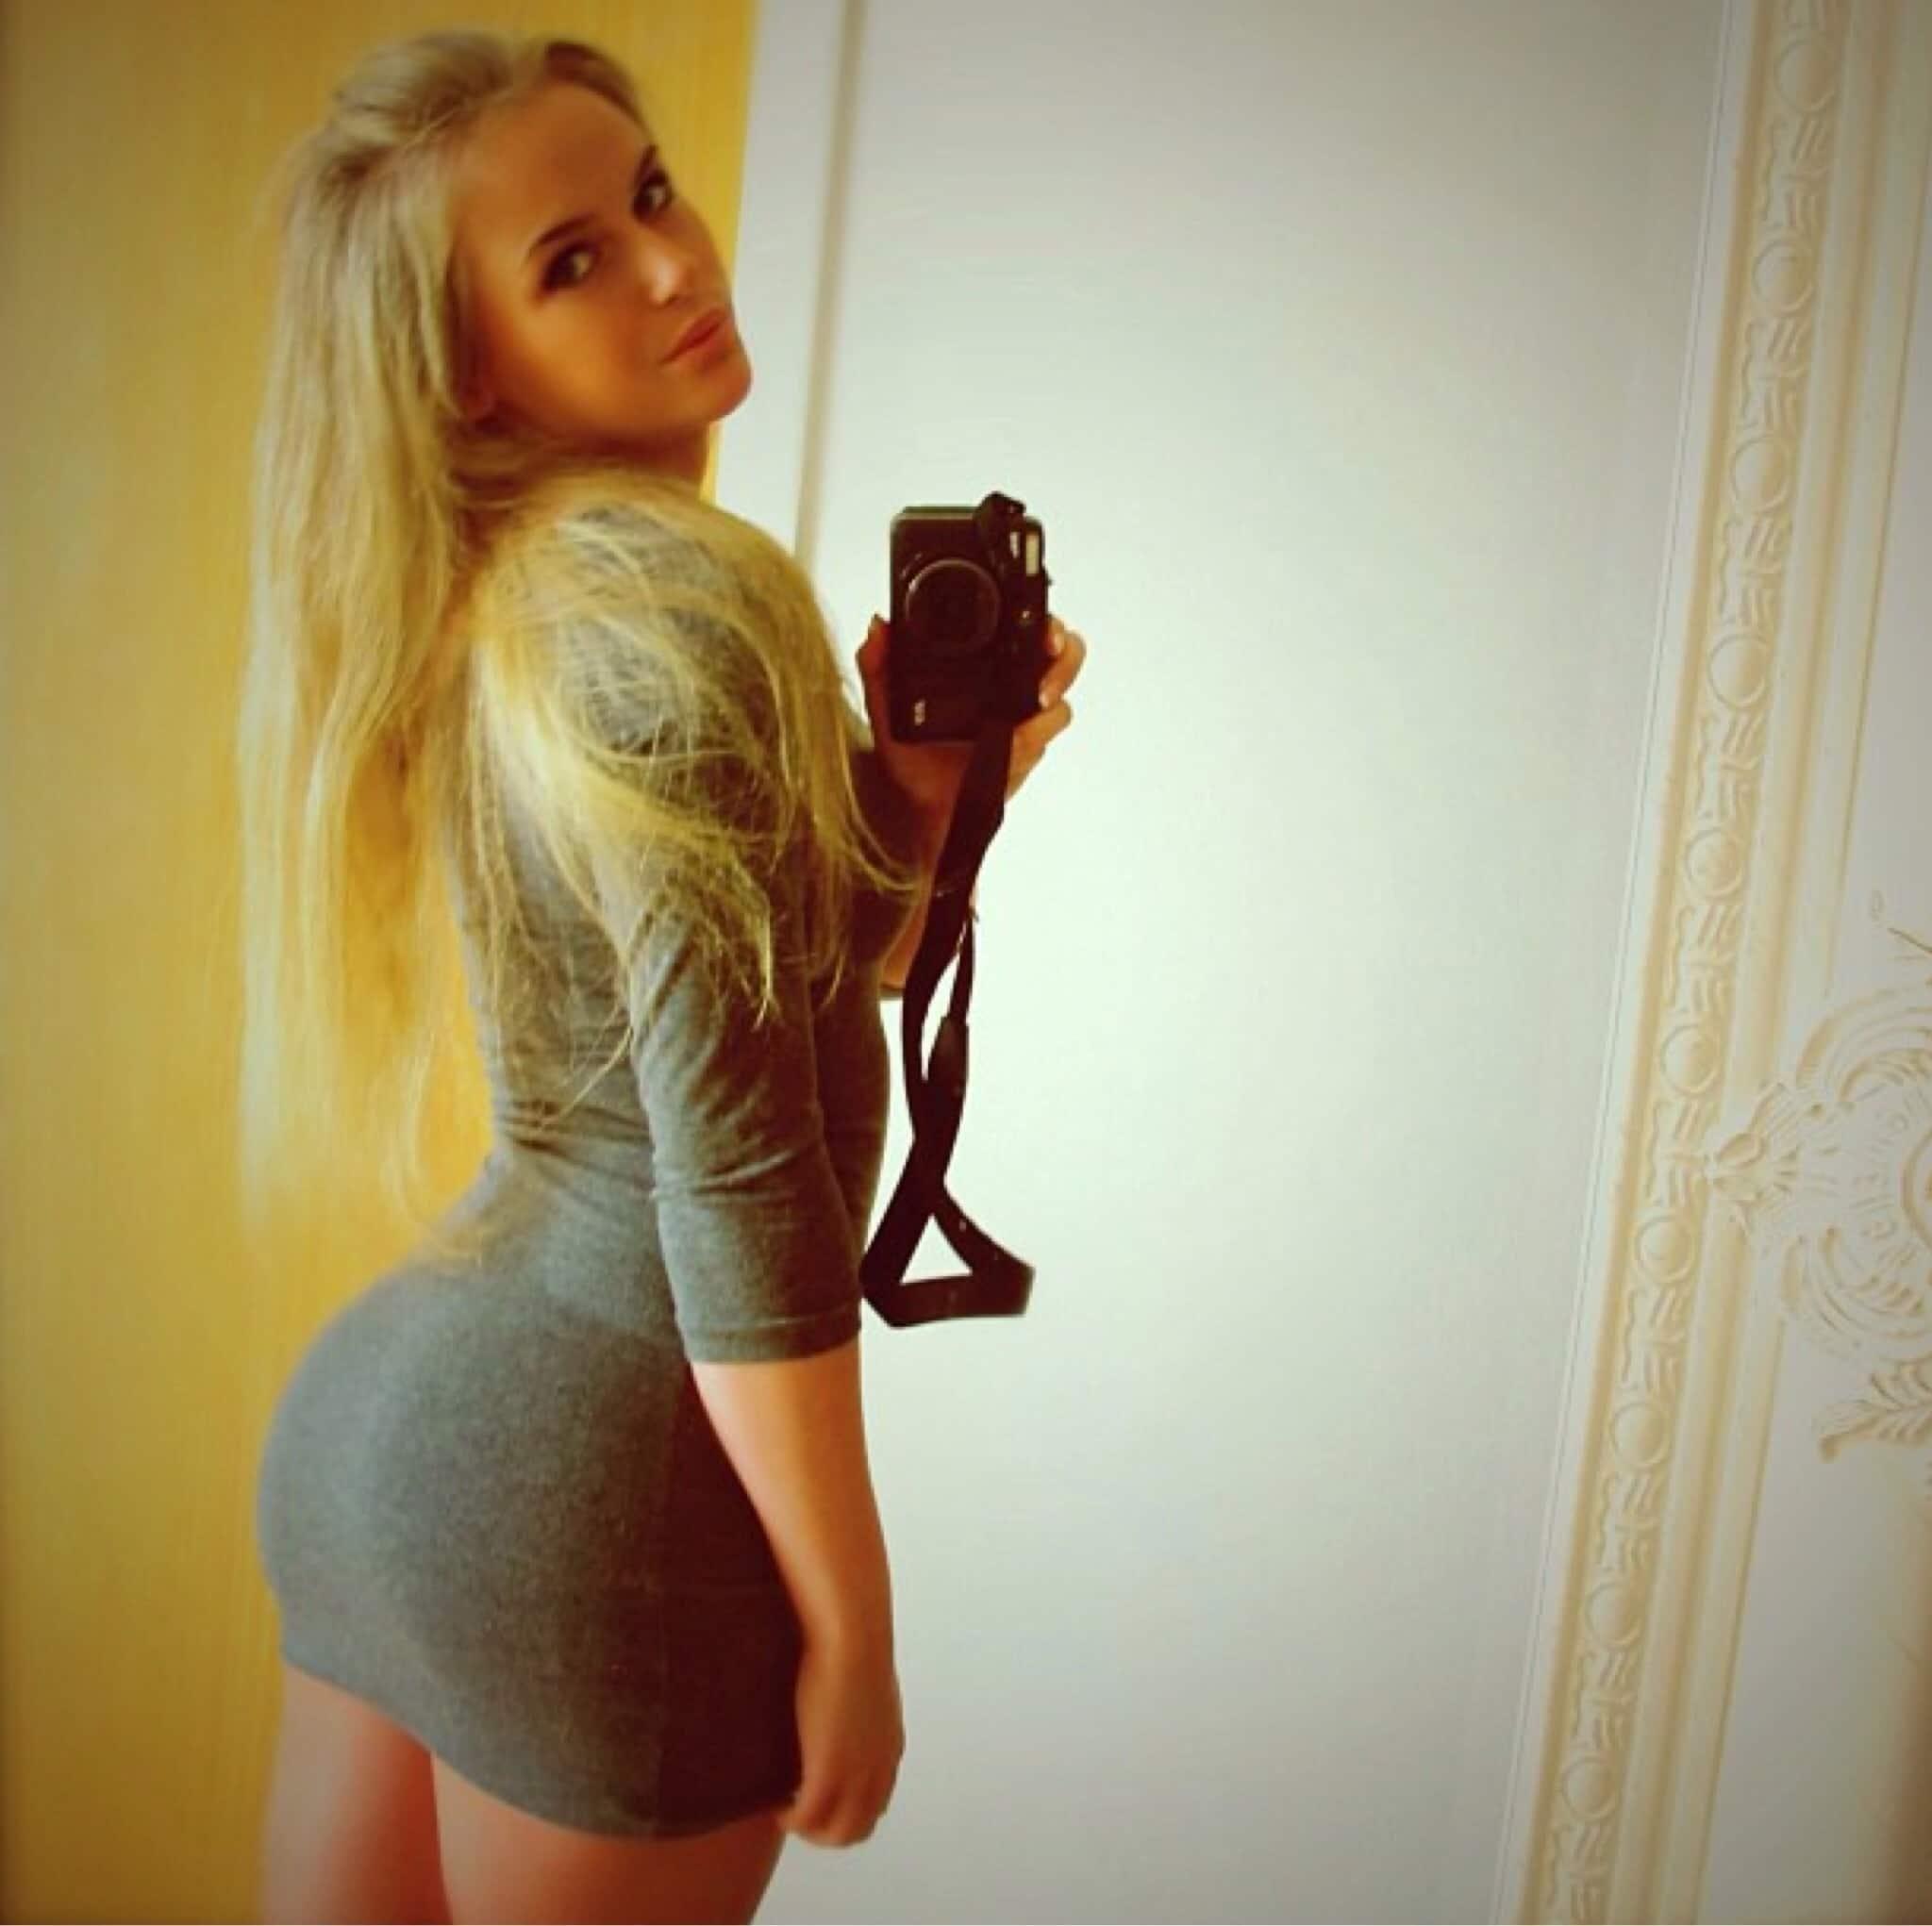 Big Booty Girl in Tight Dress